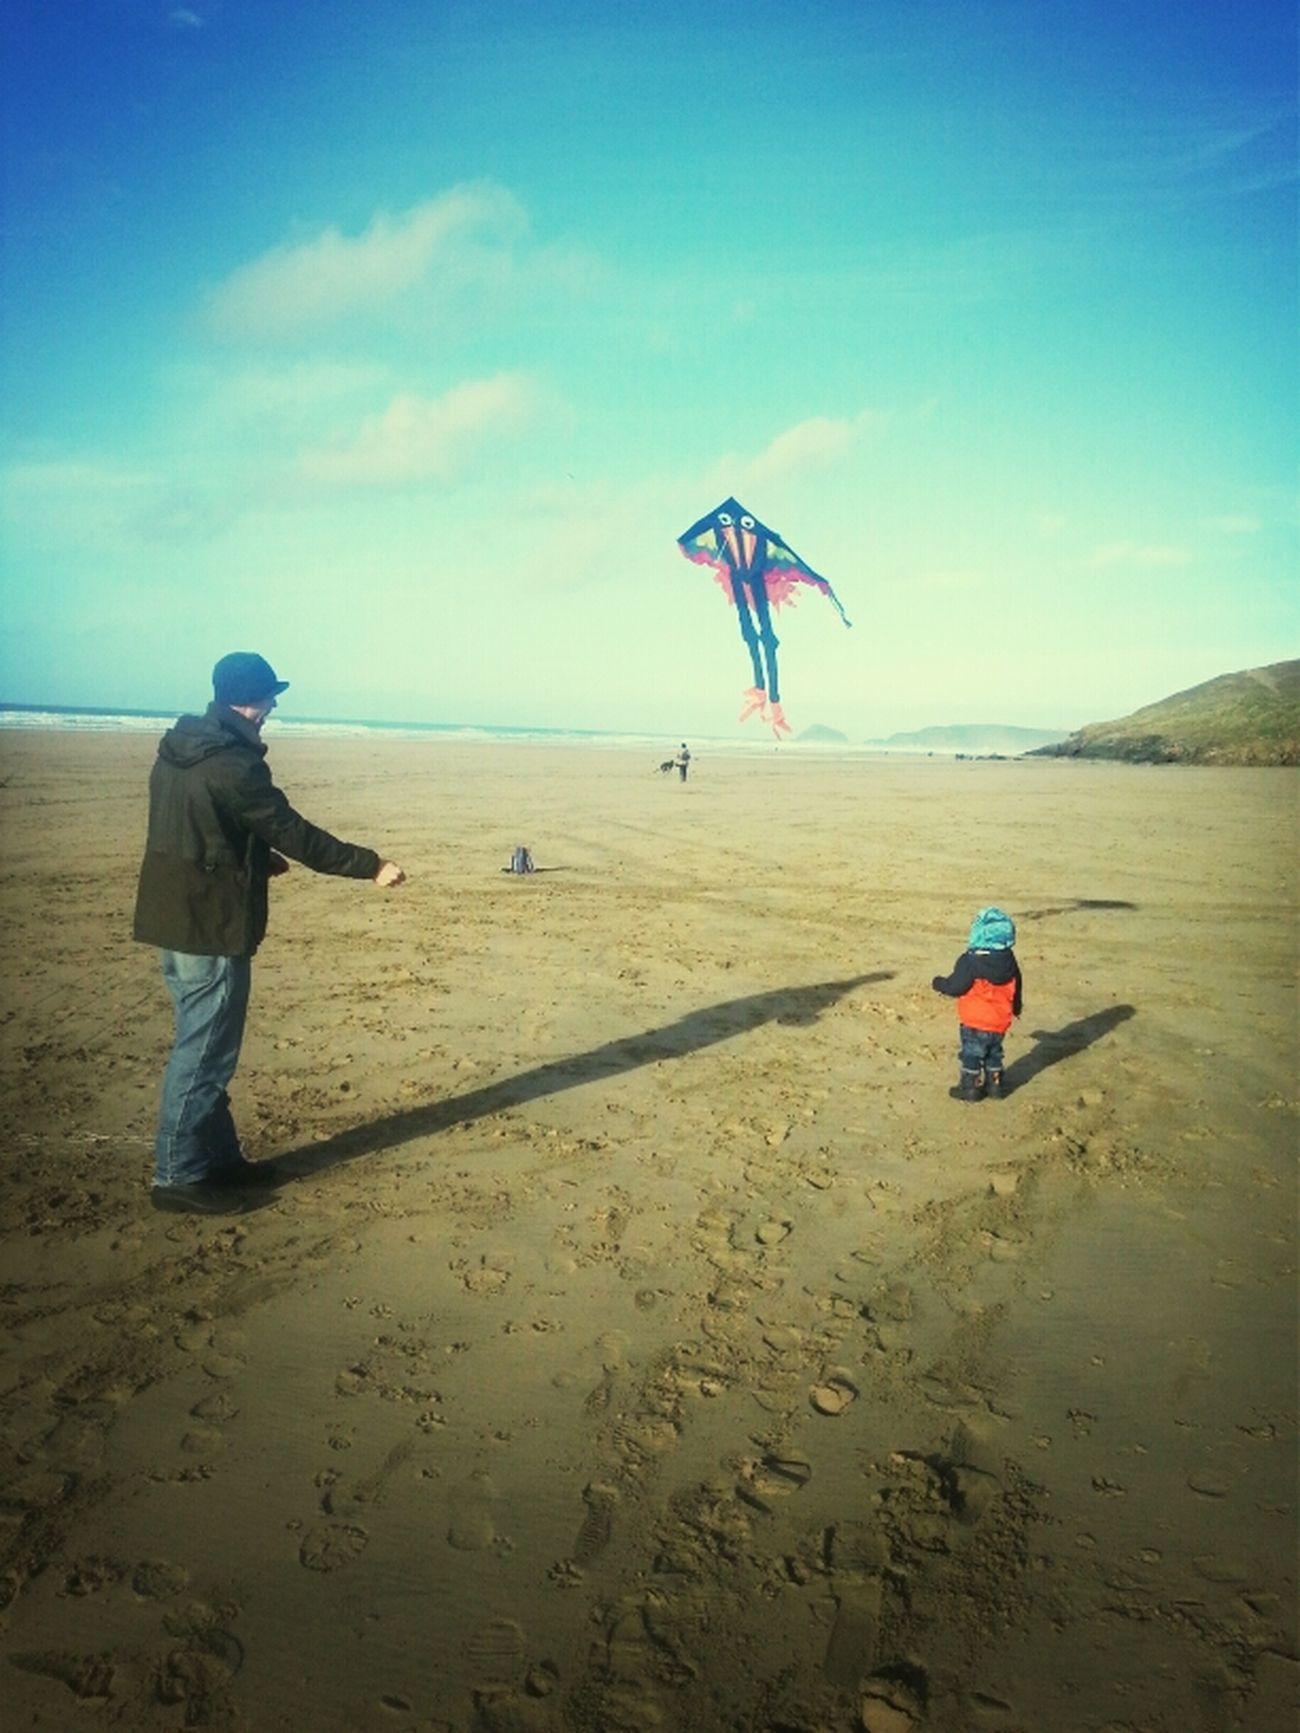 Flying A Kite Baxter